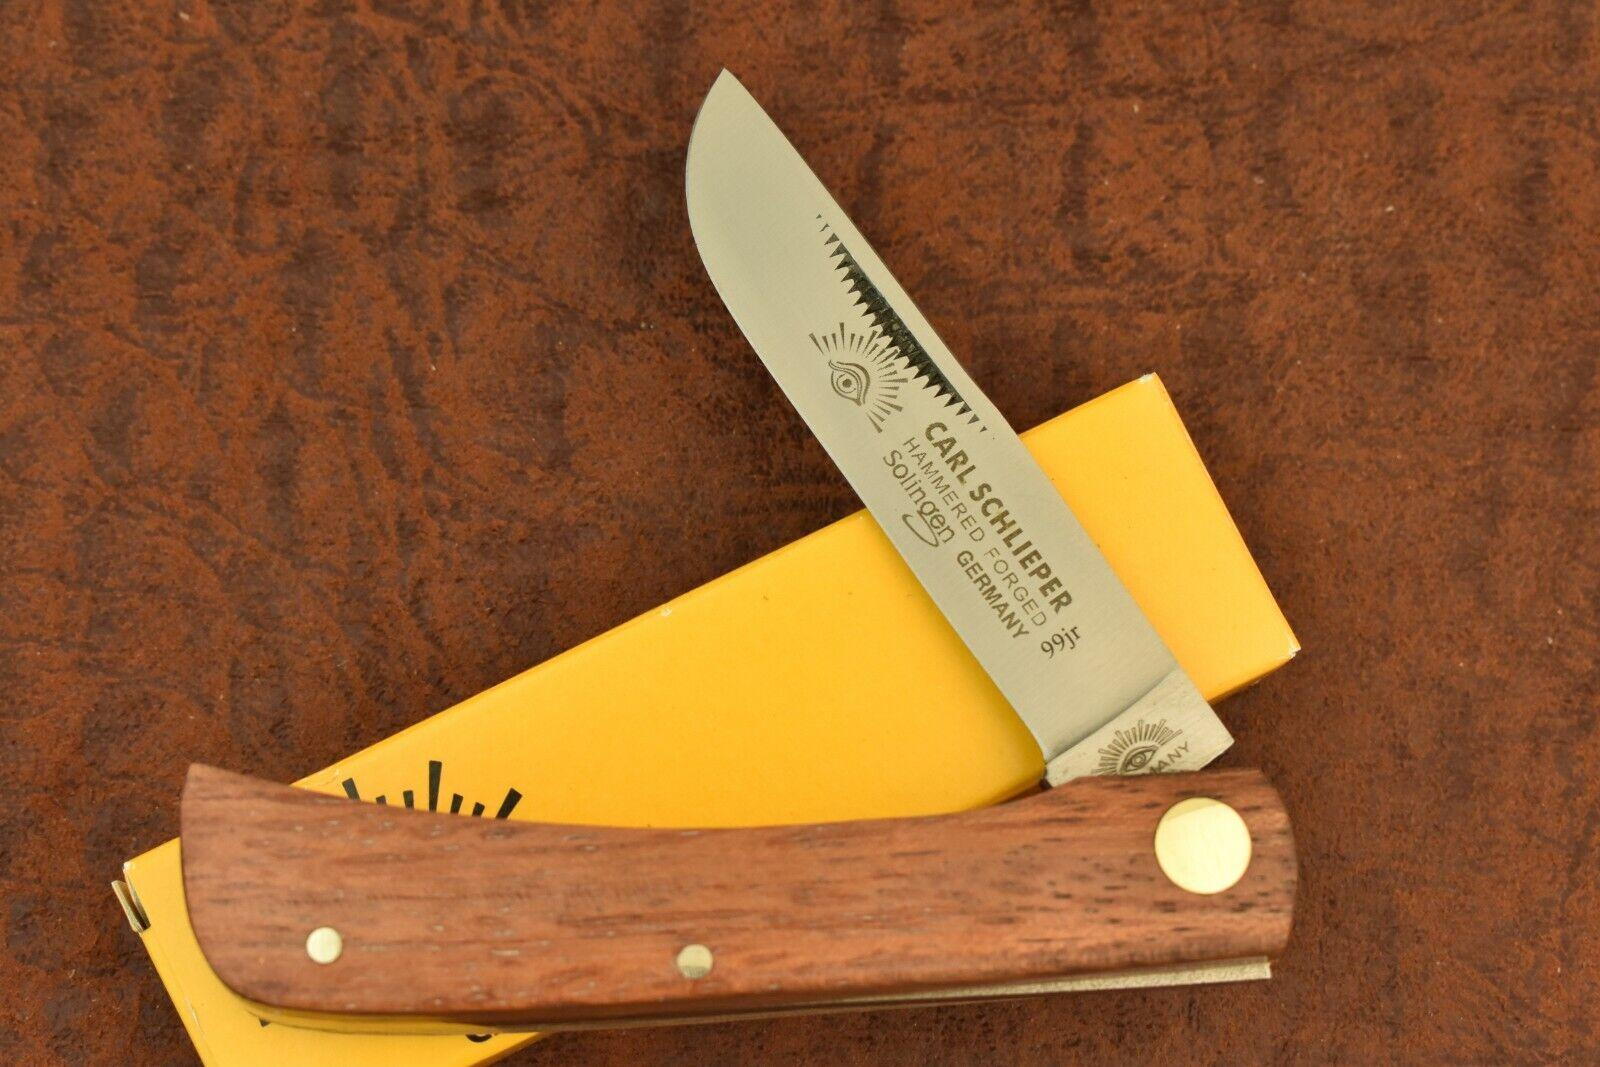 GERMAN EYE BRAND CARL SCHLIEPER WOOD SODBUSTER KNIFE 99JR SOLINGEN (7080-4)